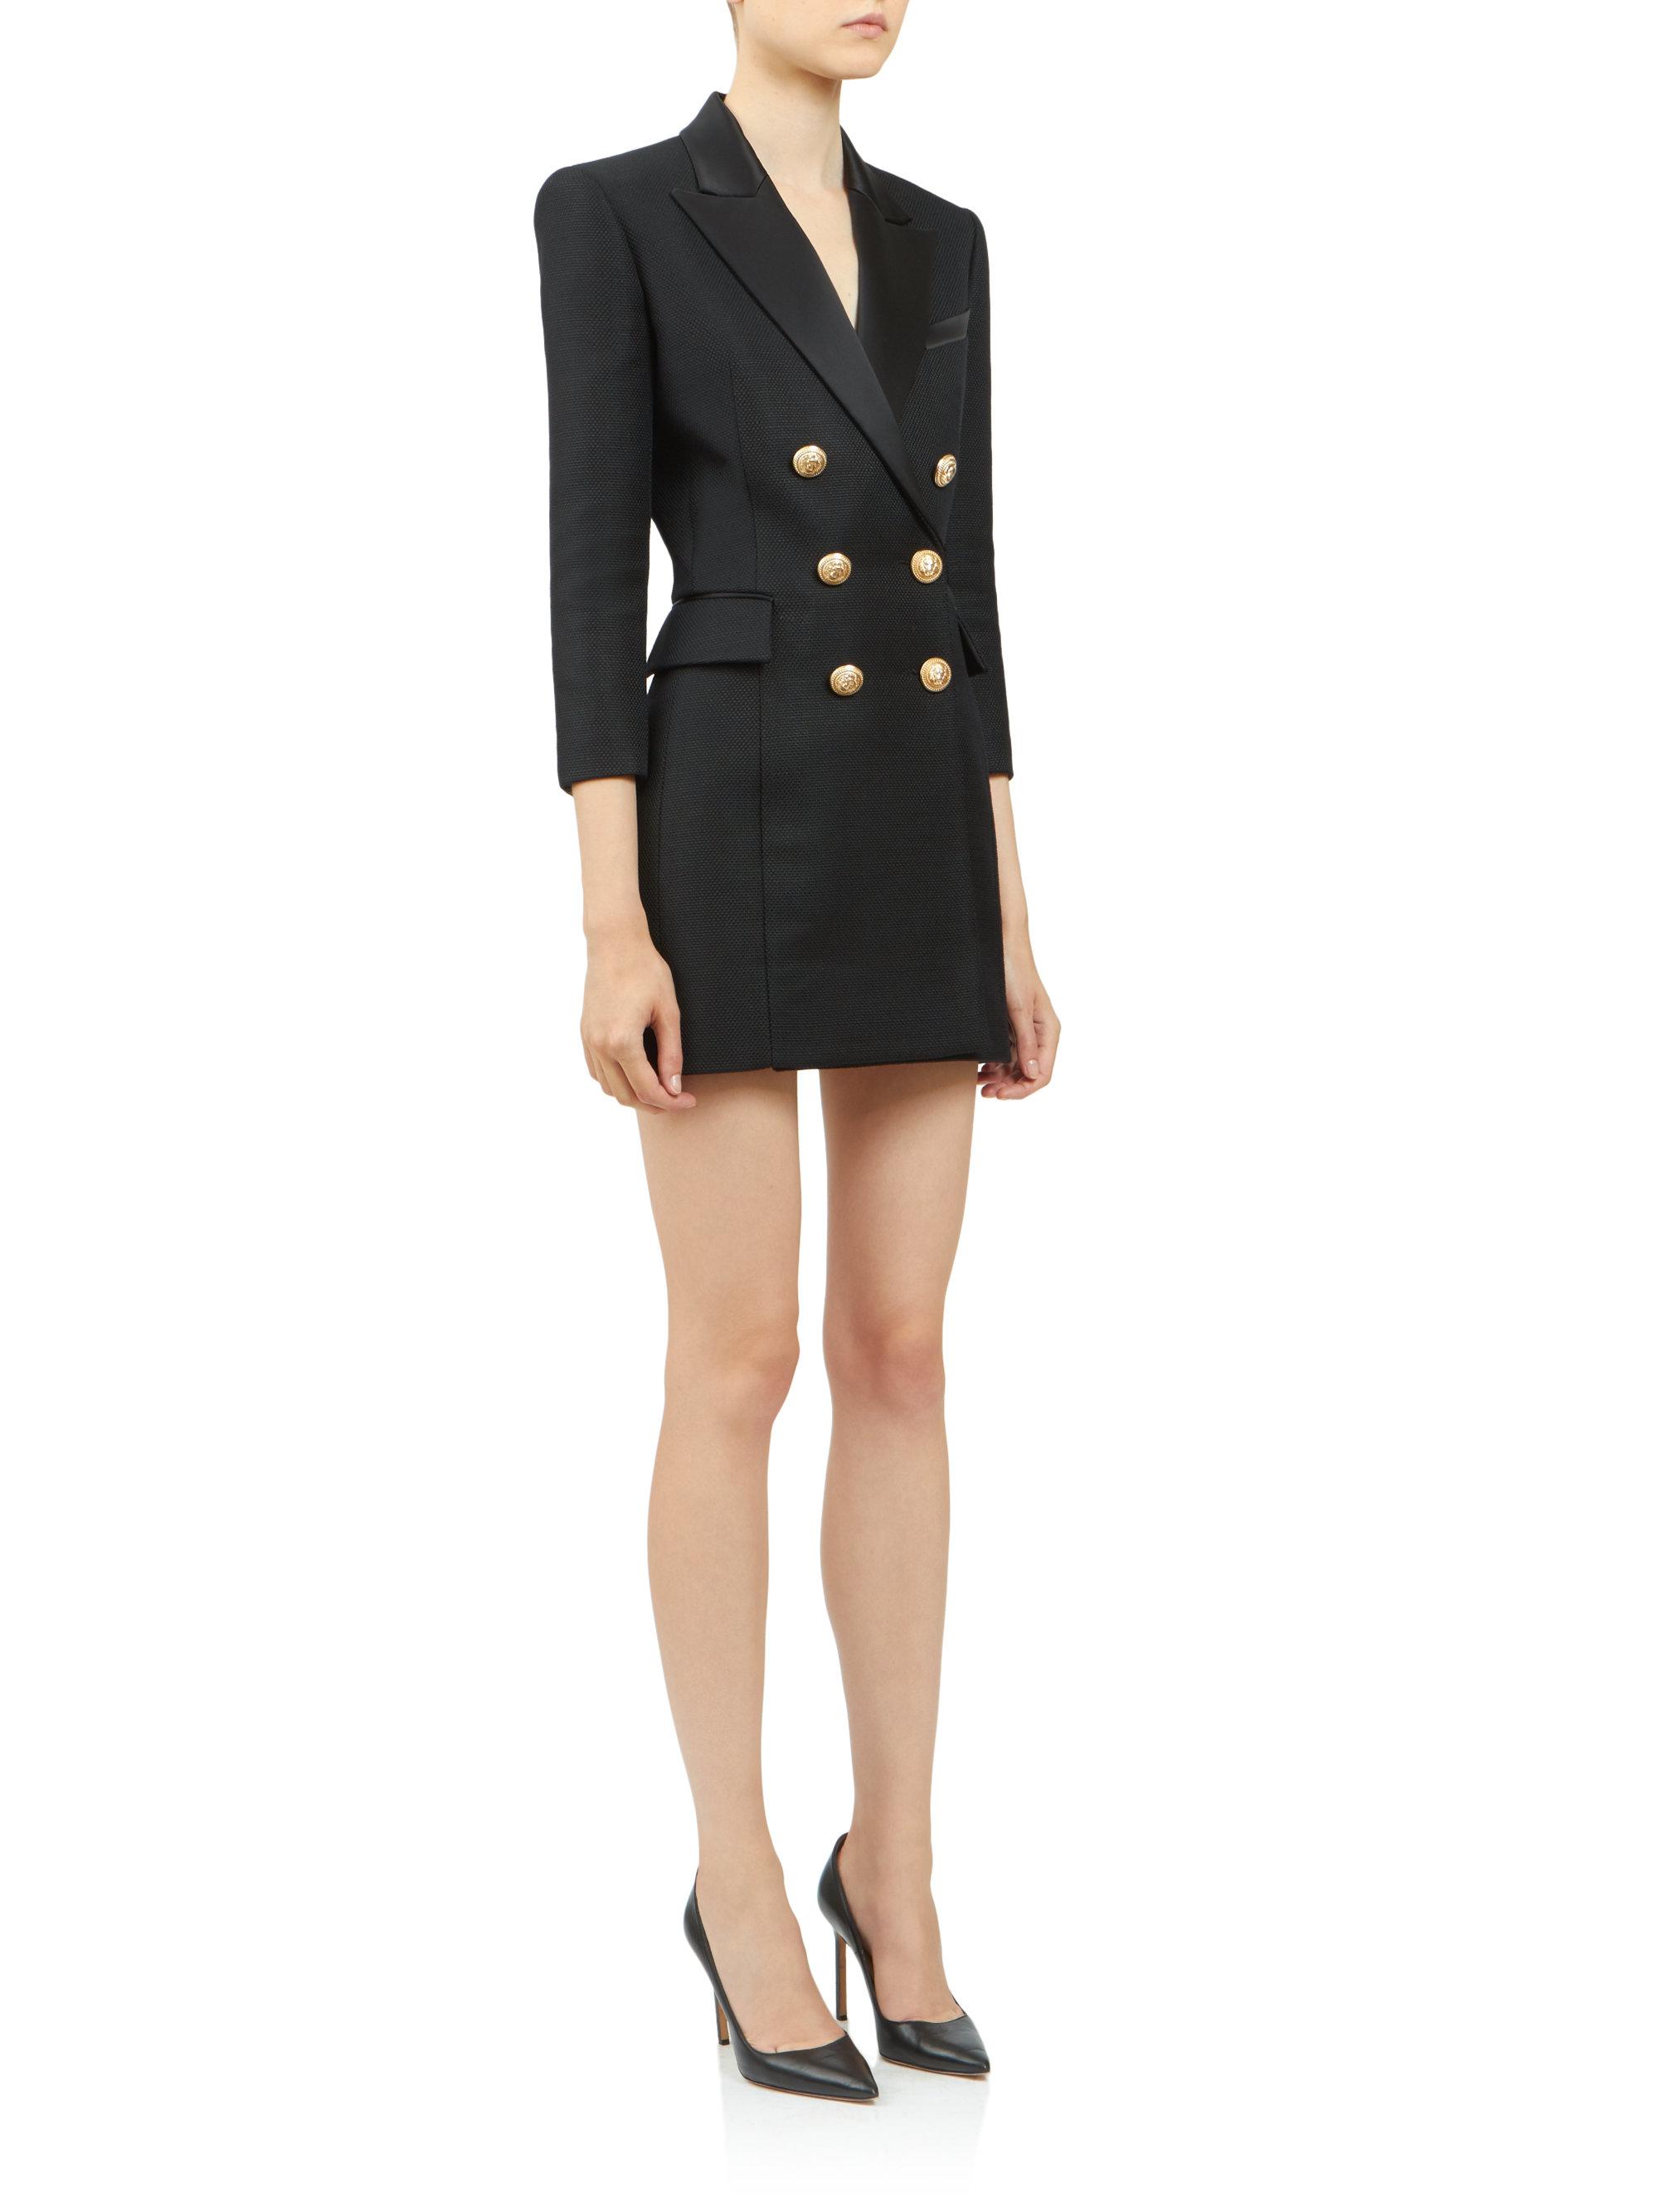 Balmain Coat | Balmain Blazer Replica | Balmain Double Breasted Blazer